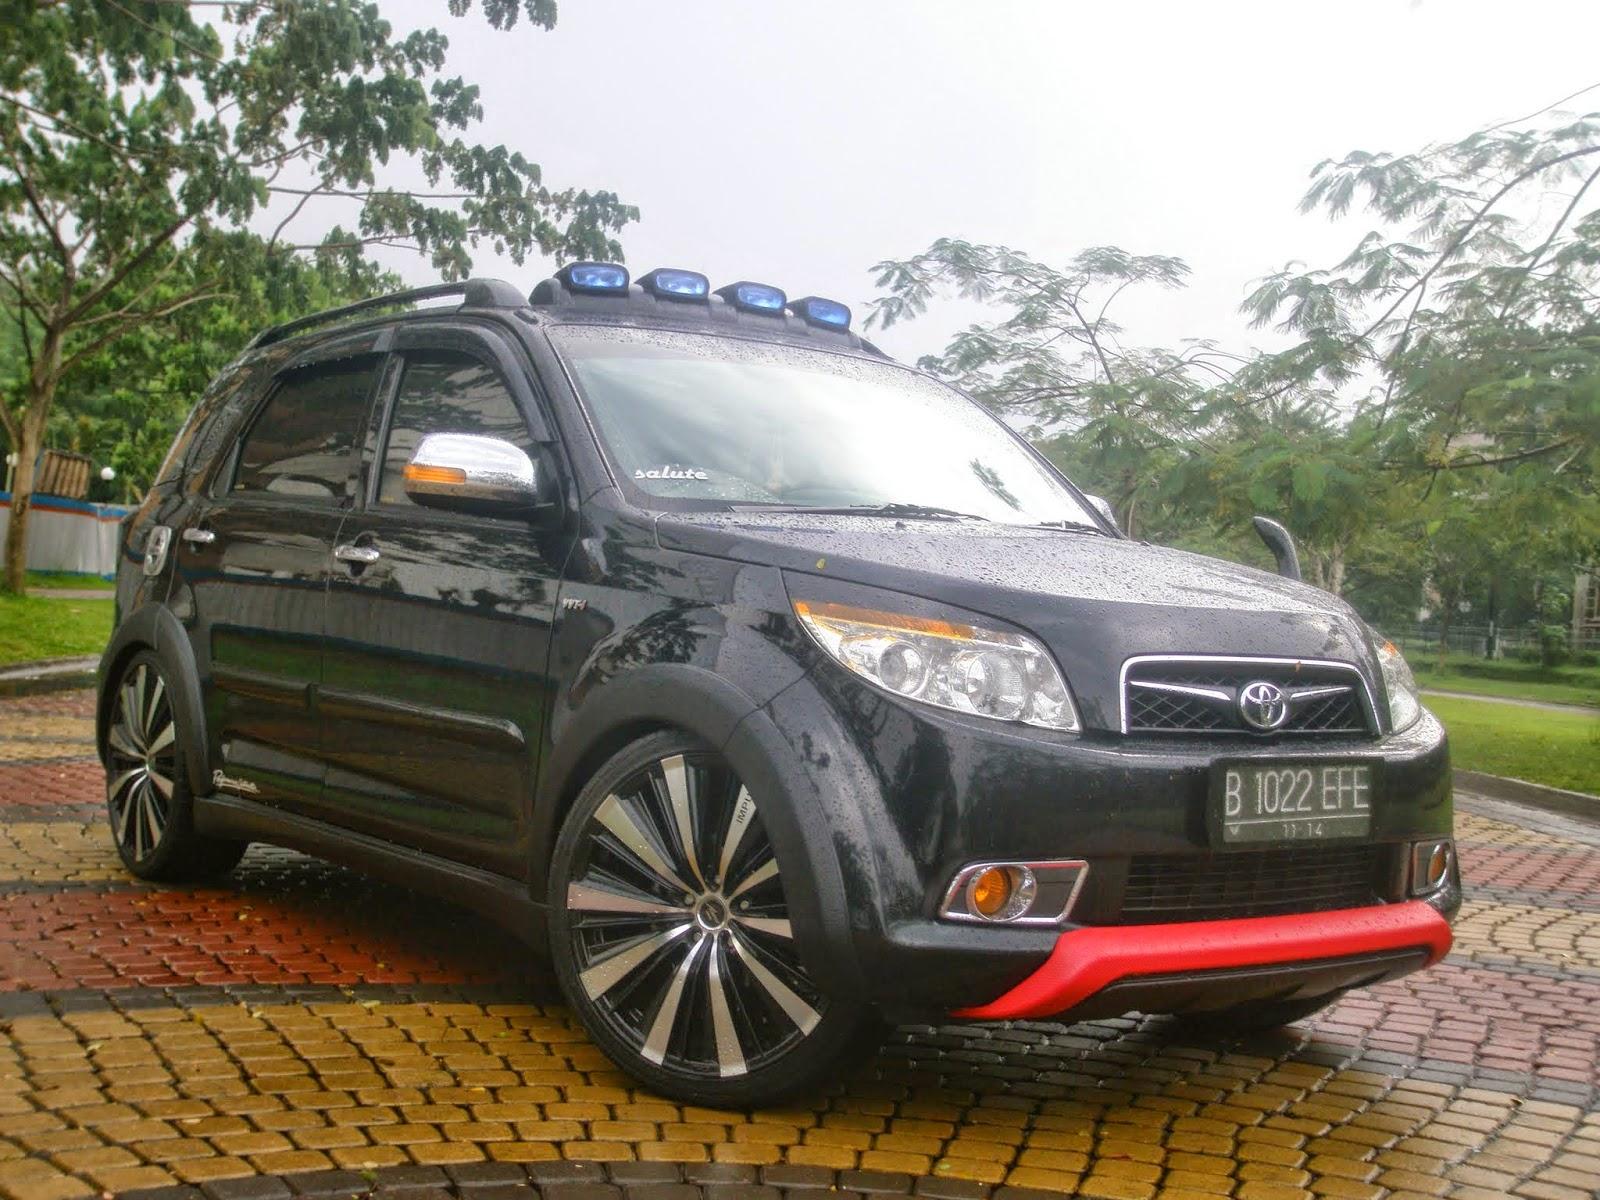 Modifikasi Grand New Avanza E Toyota Yaris Trd Sportivo Olx Koleksi Modif Mobil Warna Hitam | Ragam